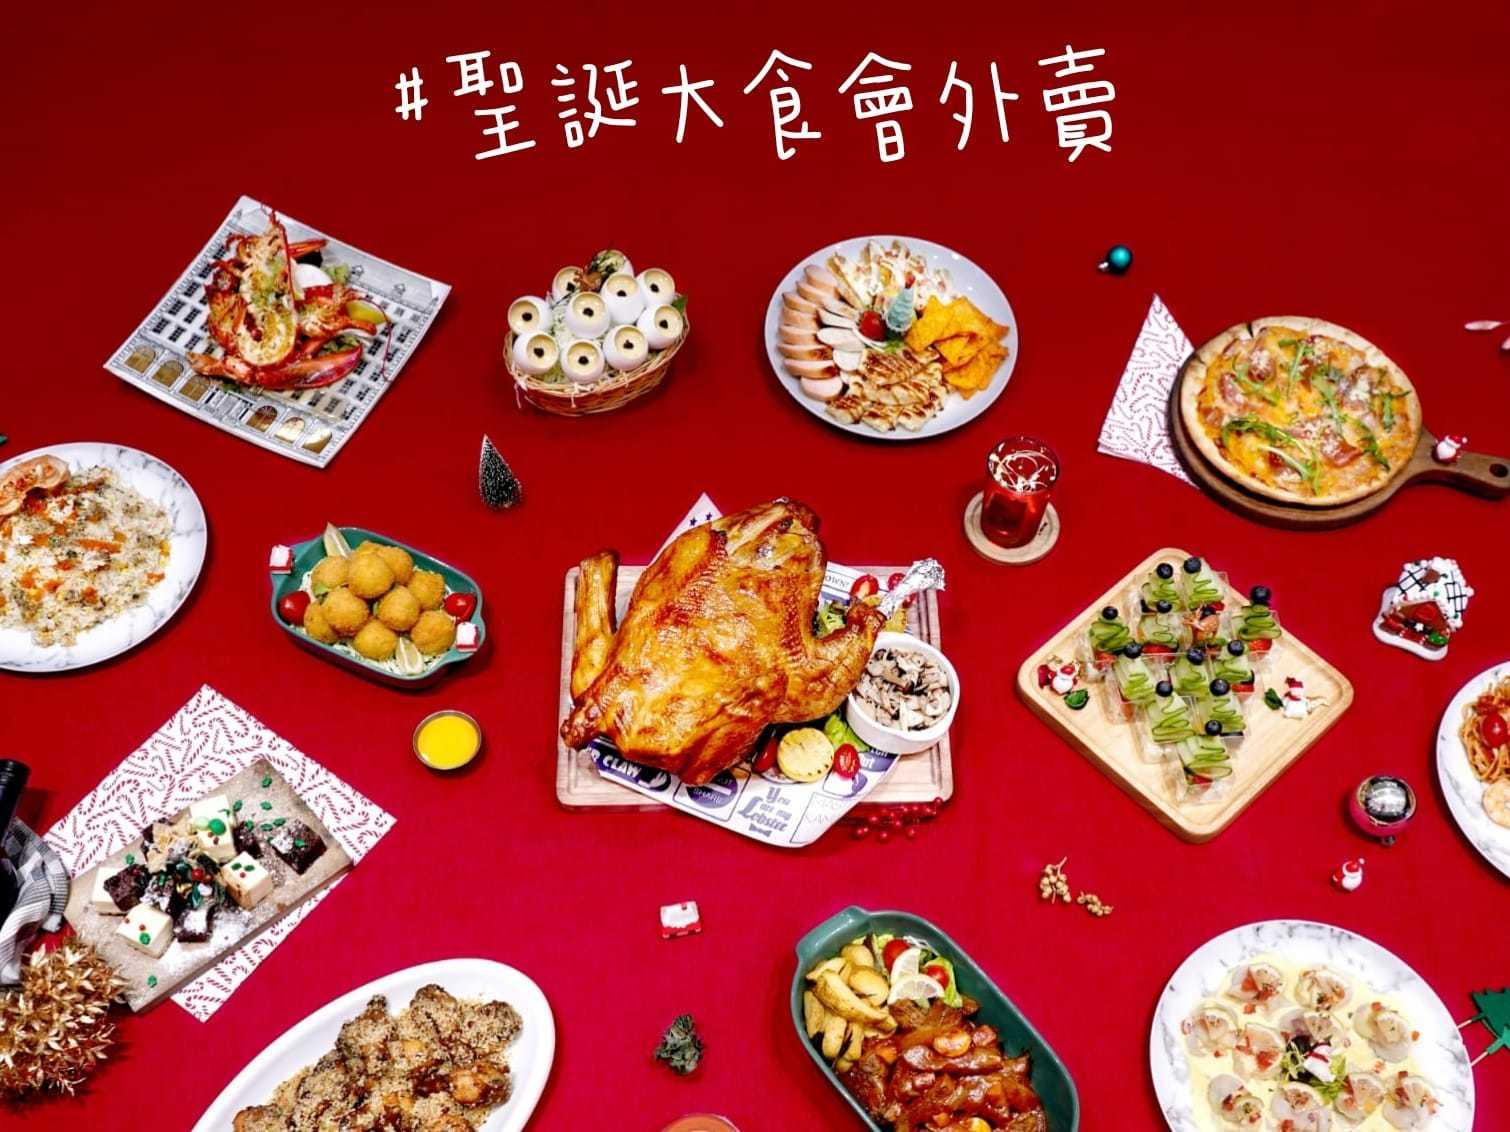 聖誕大食會外賣推介|Christams Party Food Delivery|聖誕節限定大食會套餐美食|Kamadelivery美食餐飲外送服務全香港直達